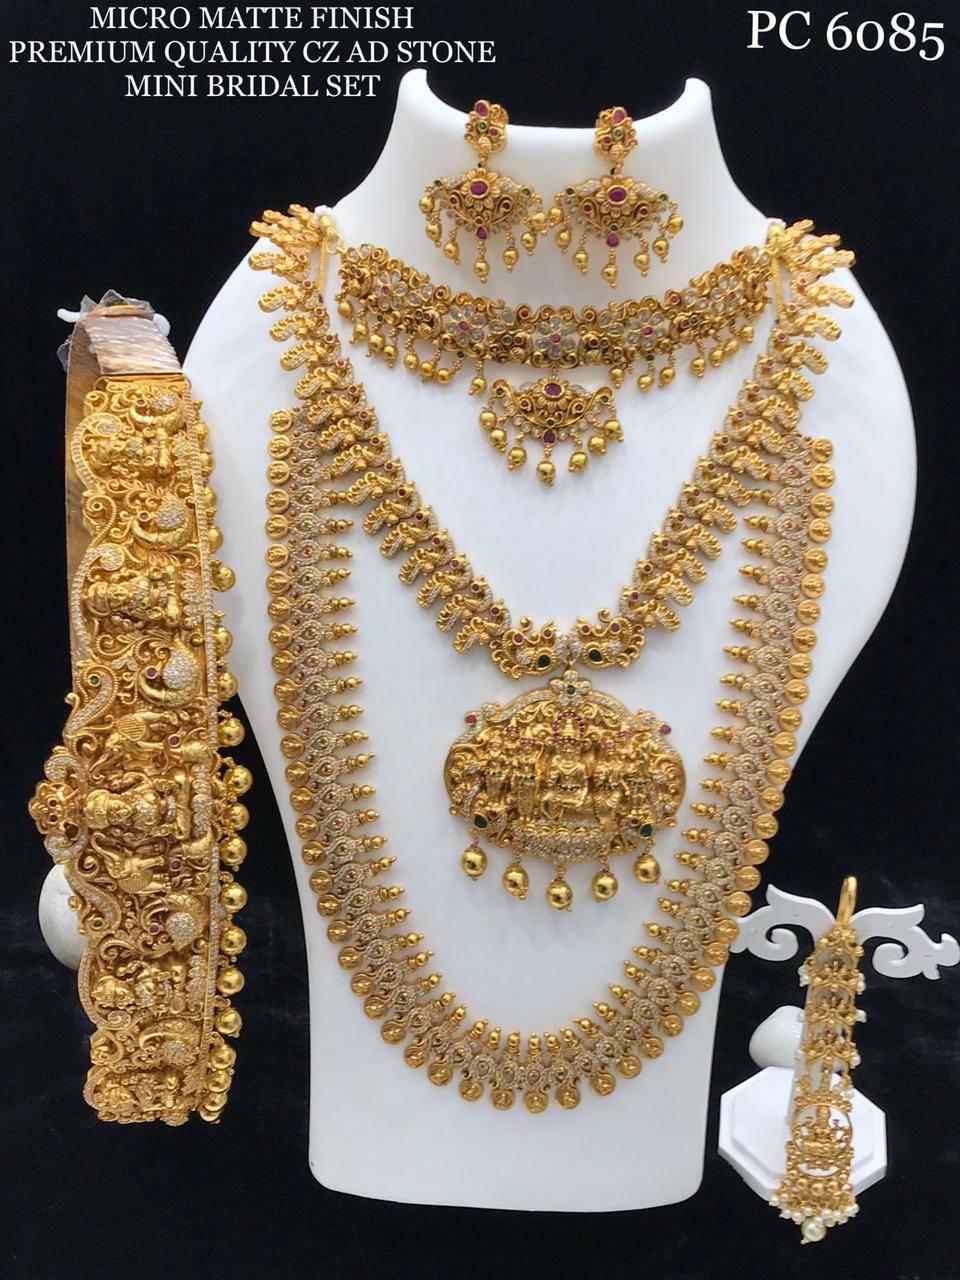 Stunning one gram gold CZ AD mini bridal set.